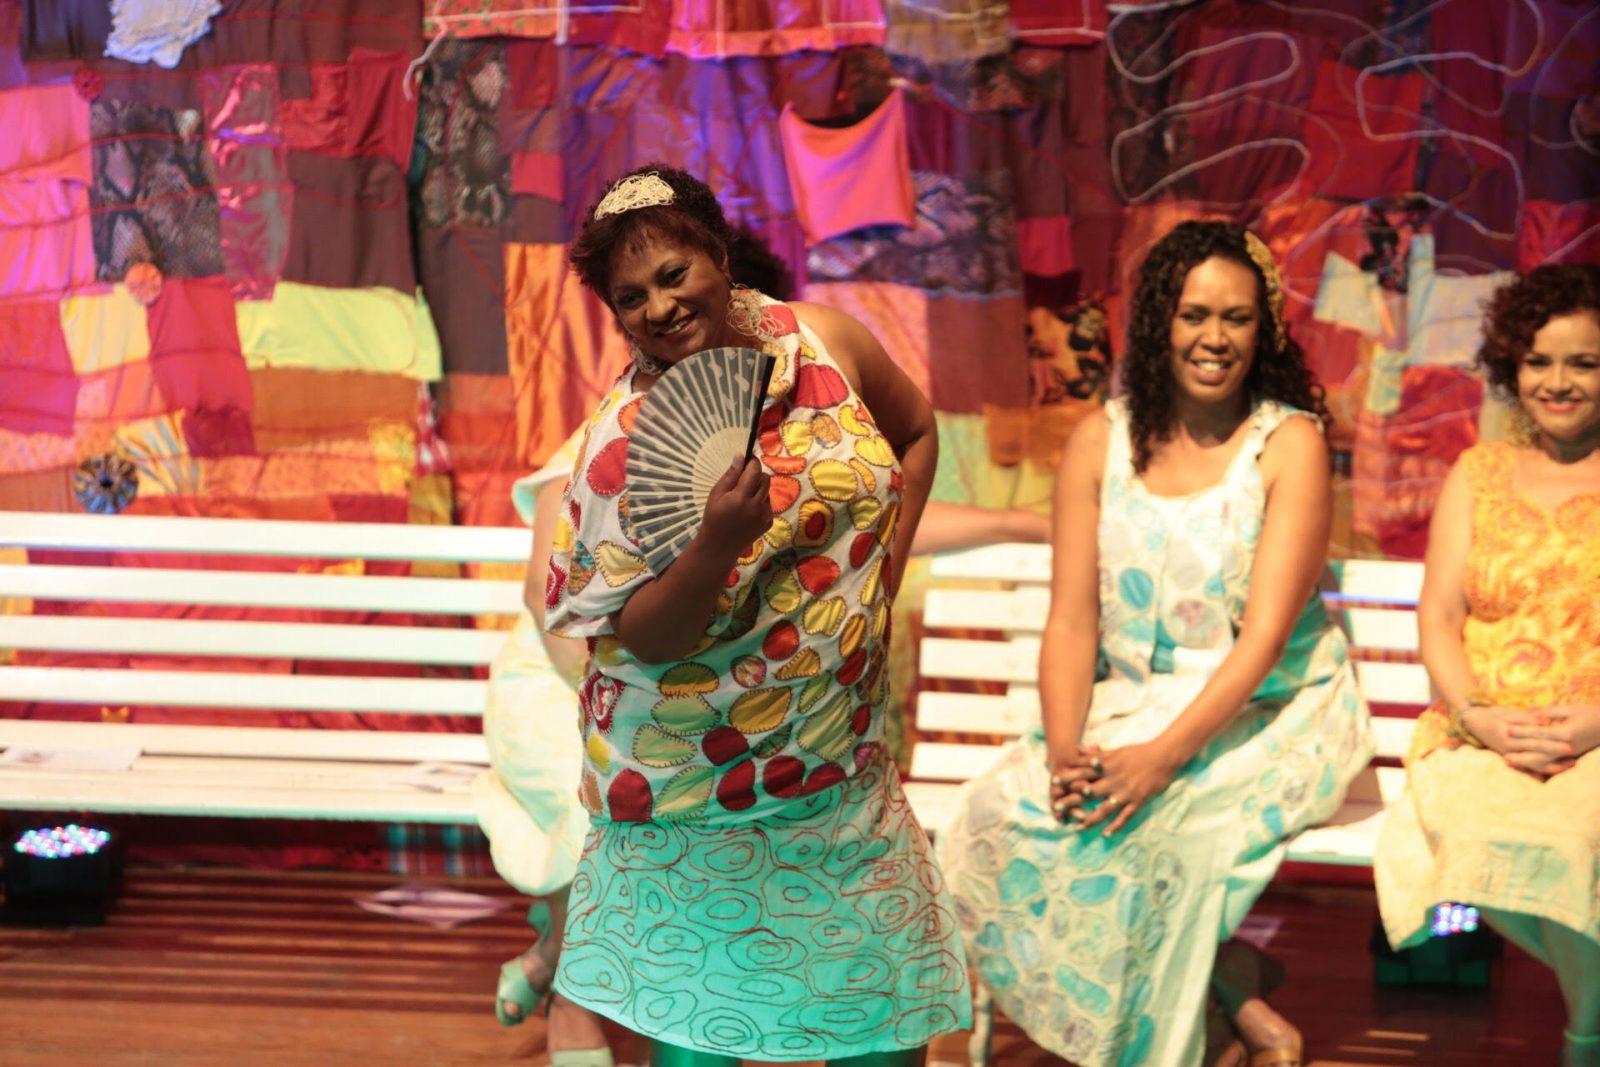 Desfile da Primavera - Anhembi Morumbi - ModaNews (1)